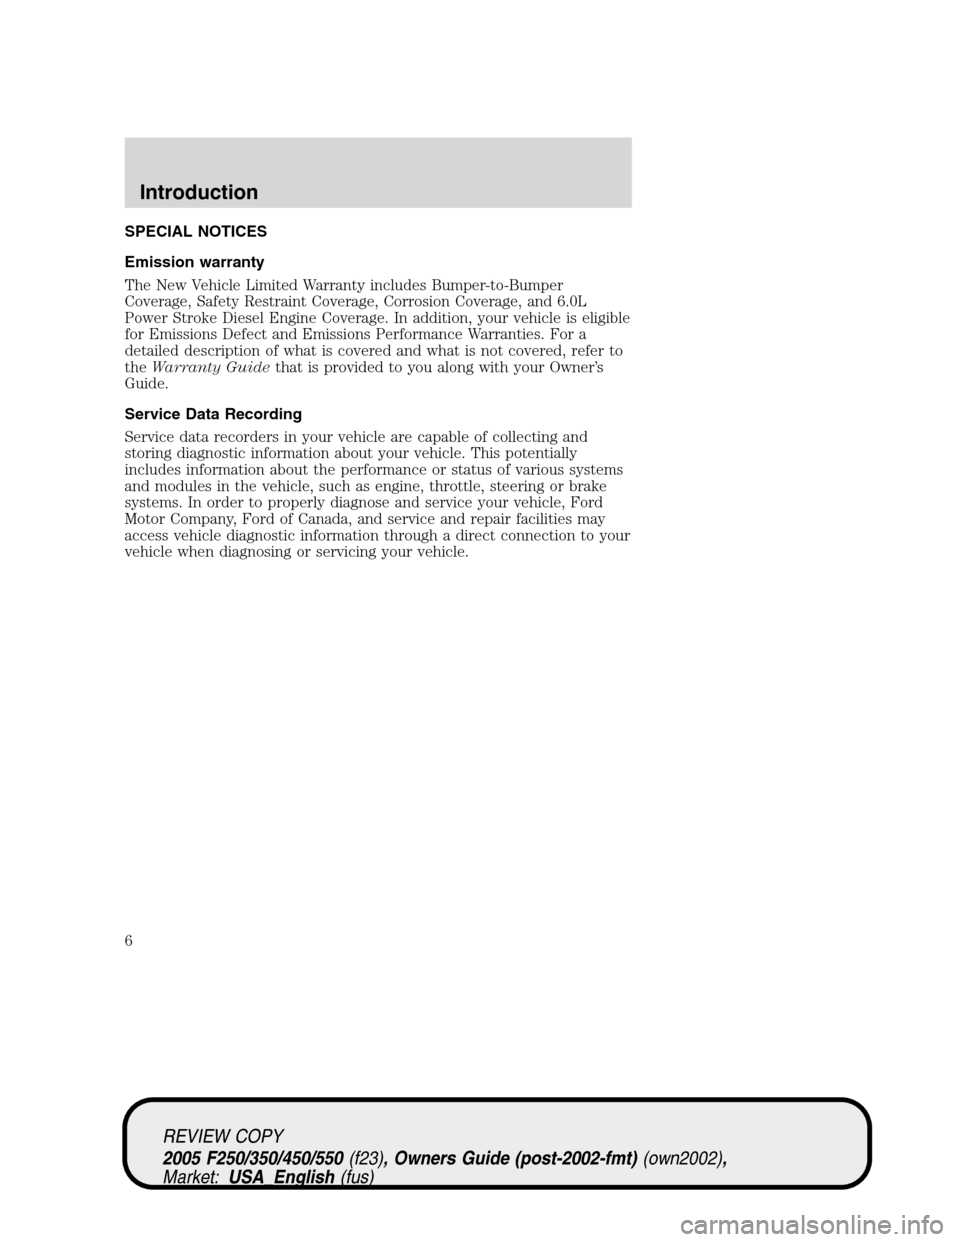 2005 ford f250 diesel owners manual